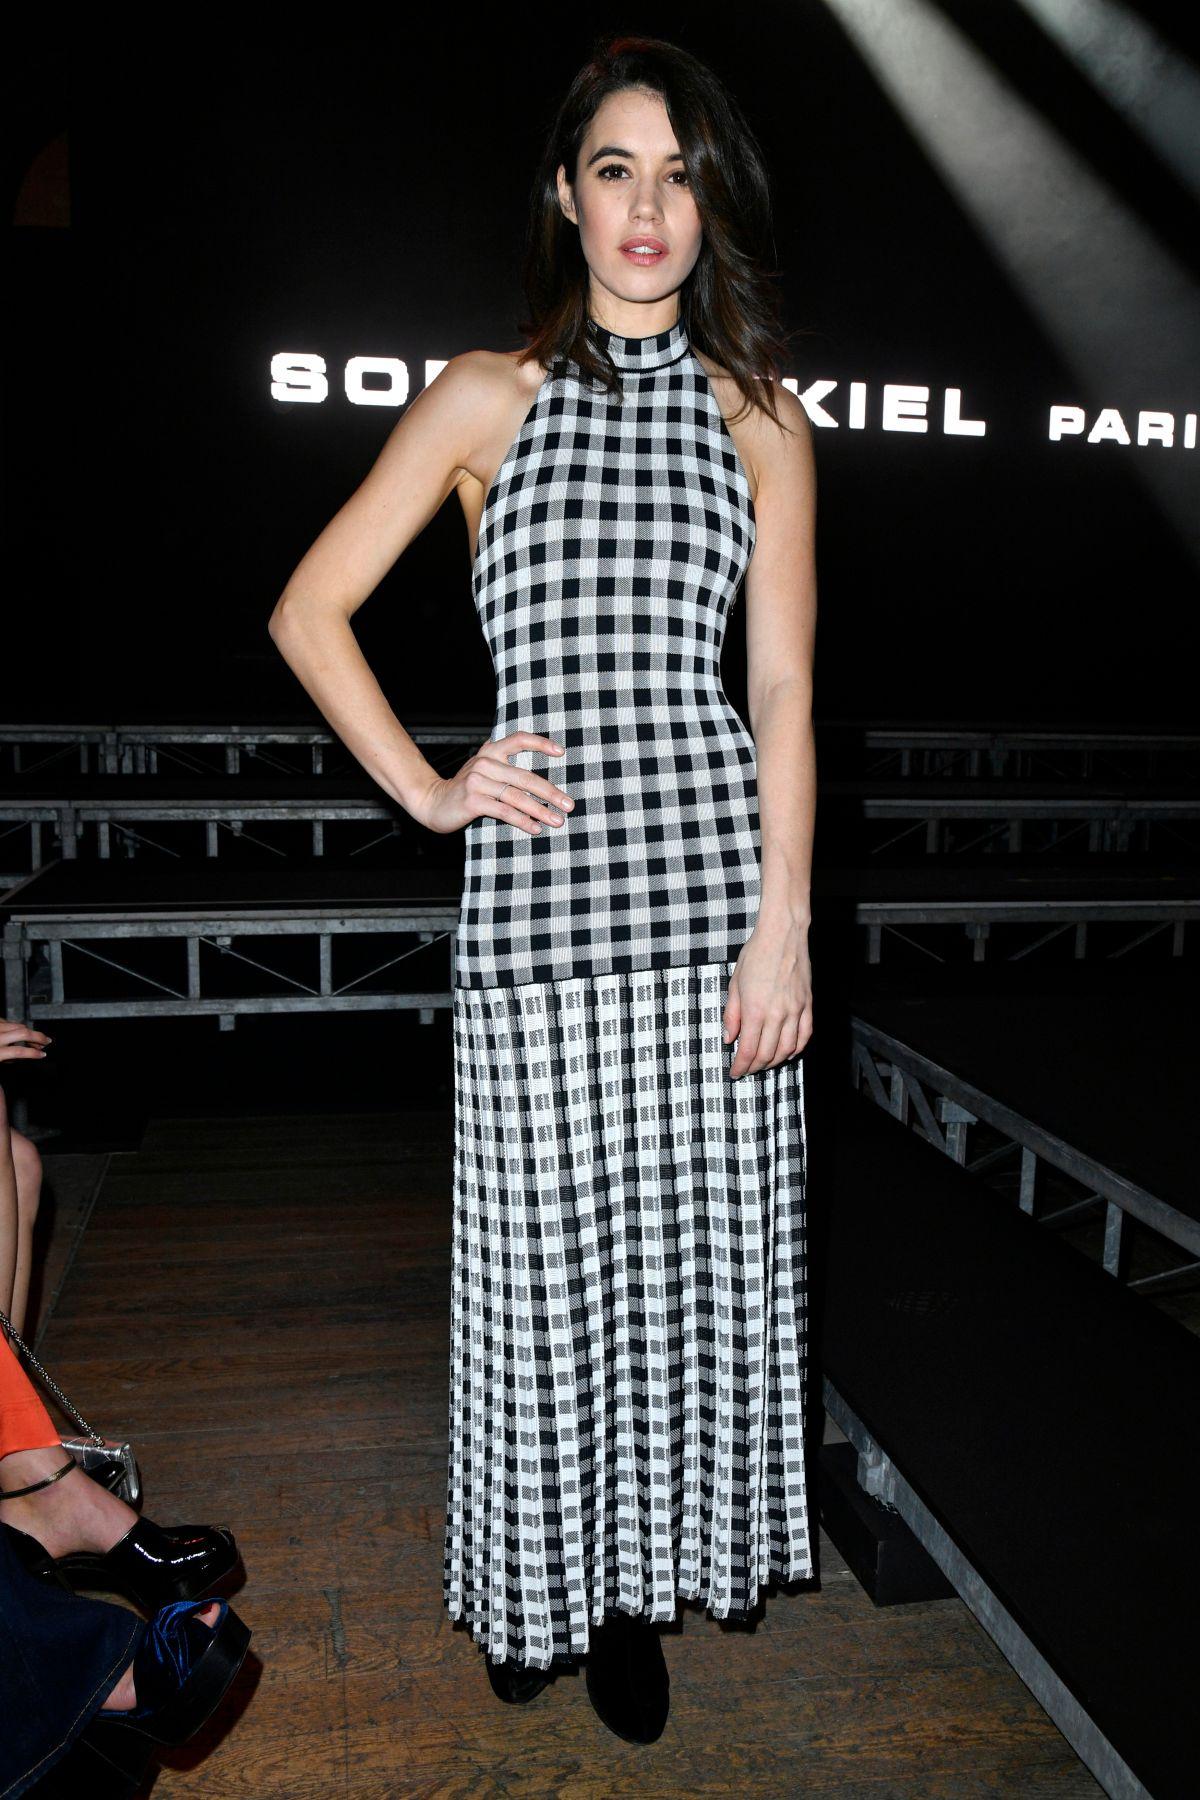 b2b2f5a692 GALA GORDON at Sonia Rykiel Fashion Show in Paris 03/03/2018 ...